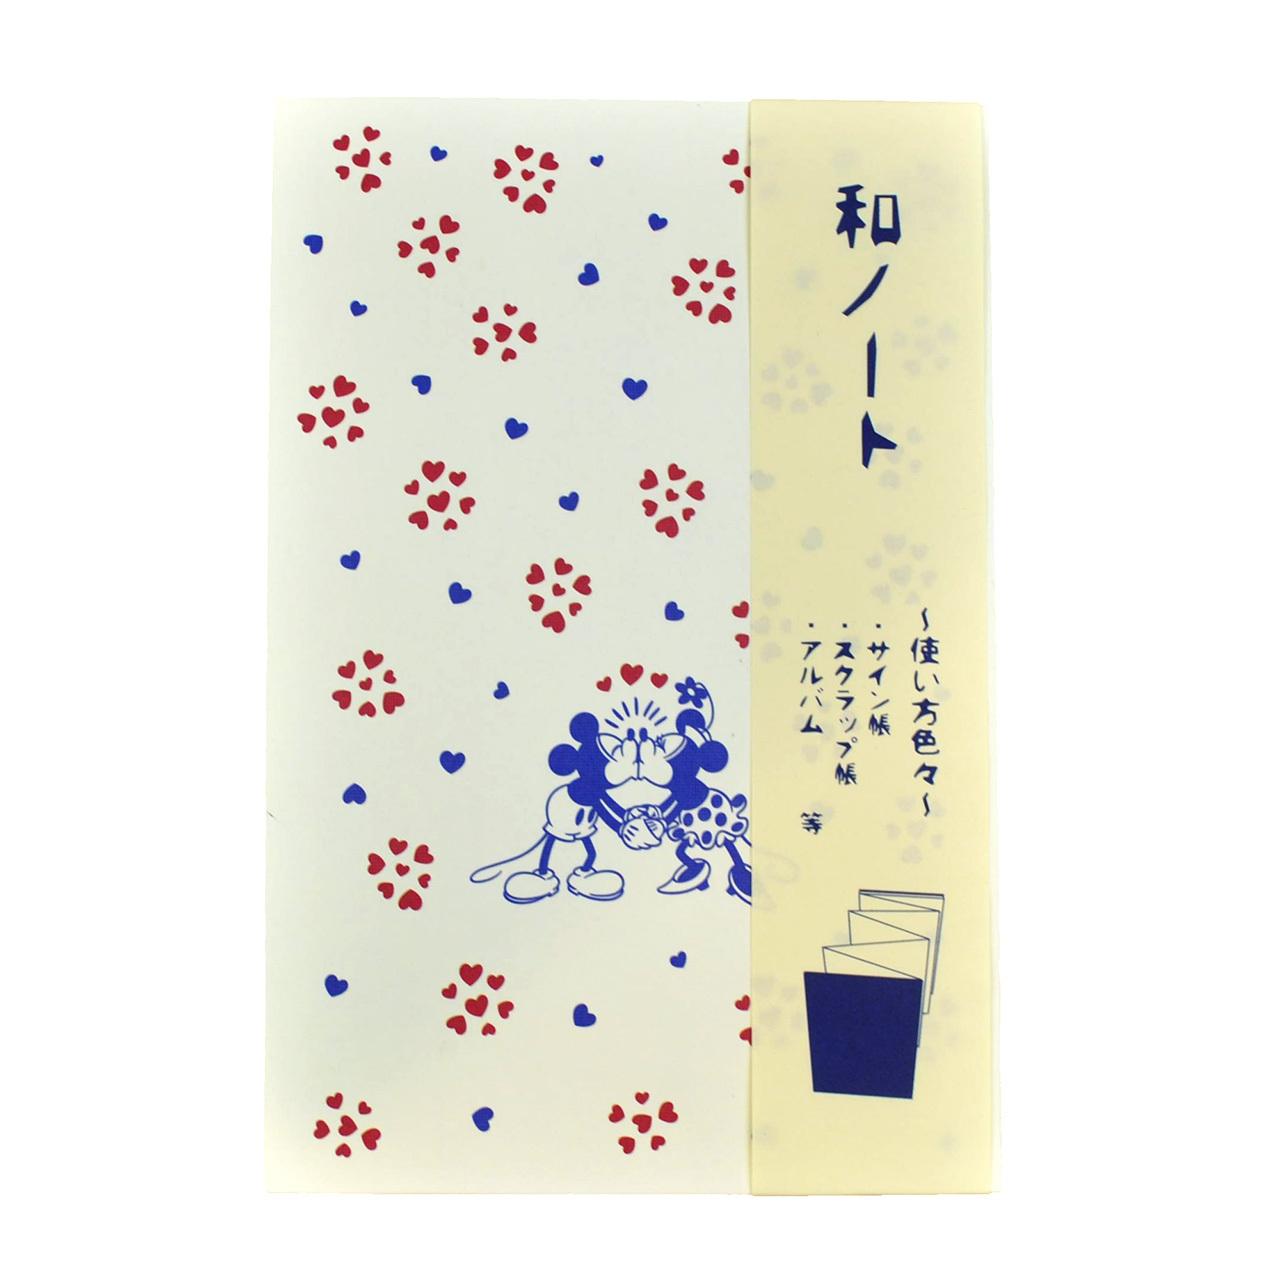 DIS和ノート (MK&MN ハートづくし)